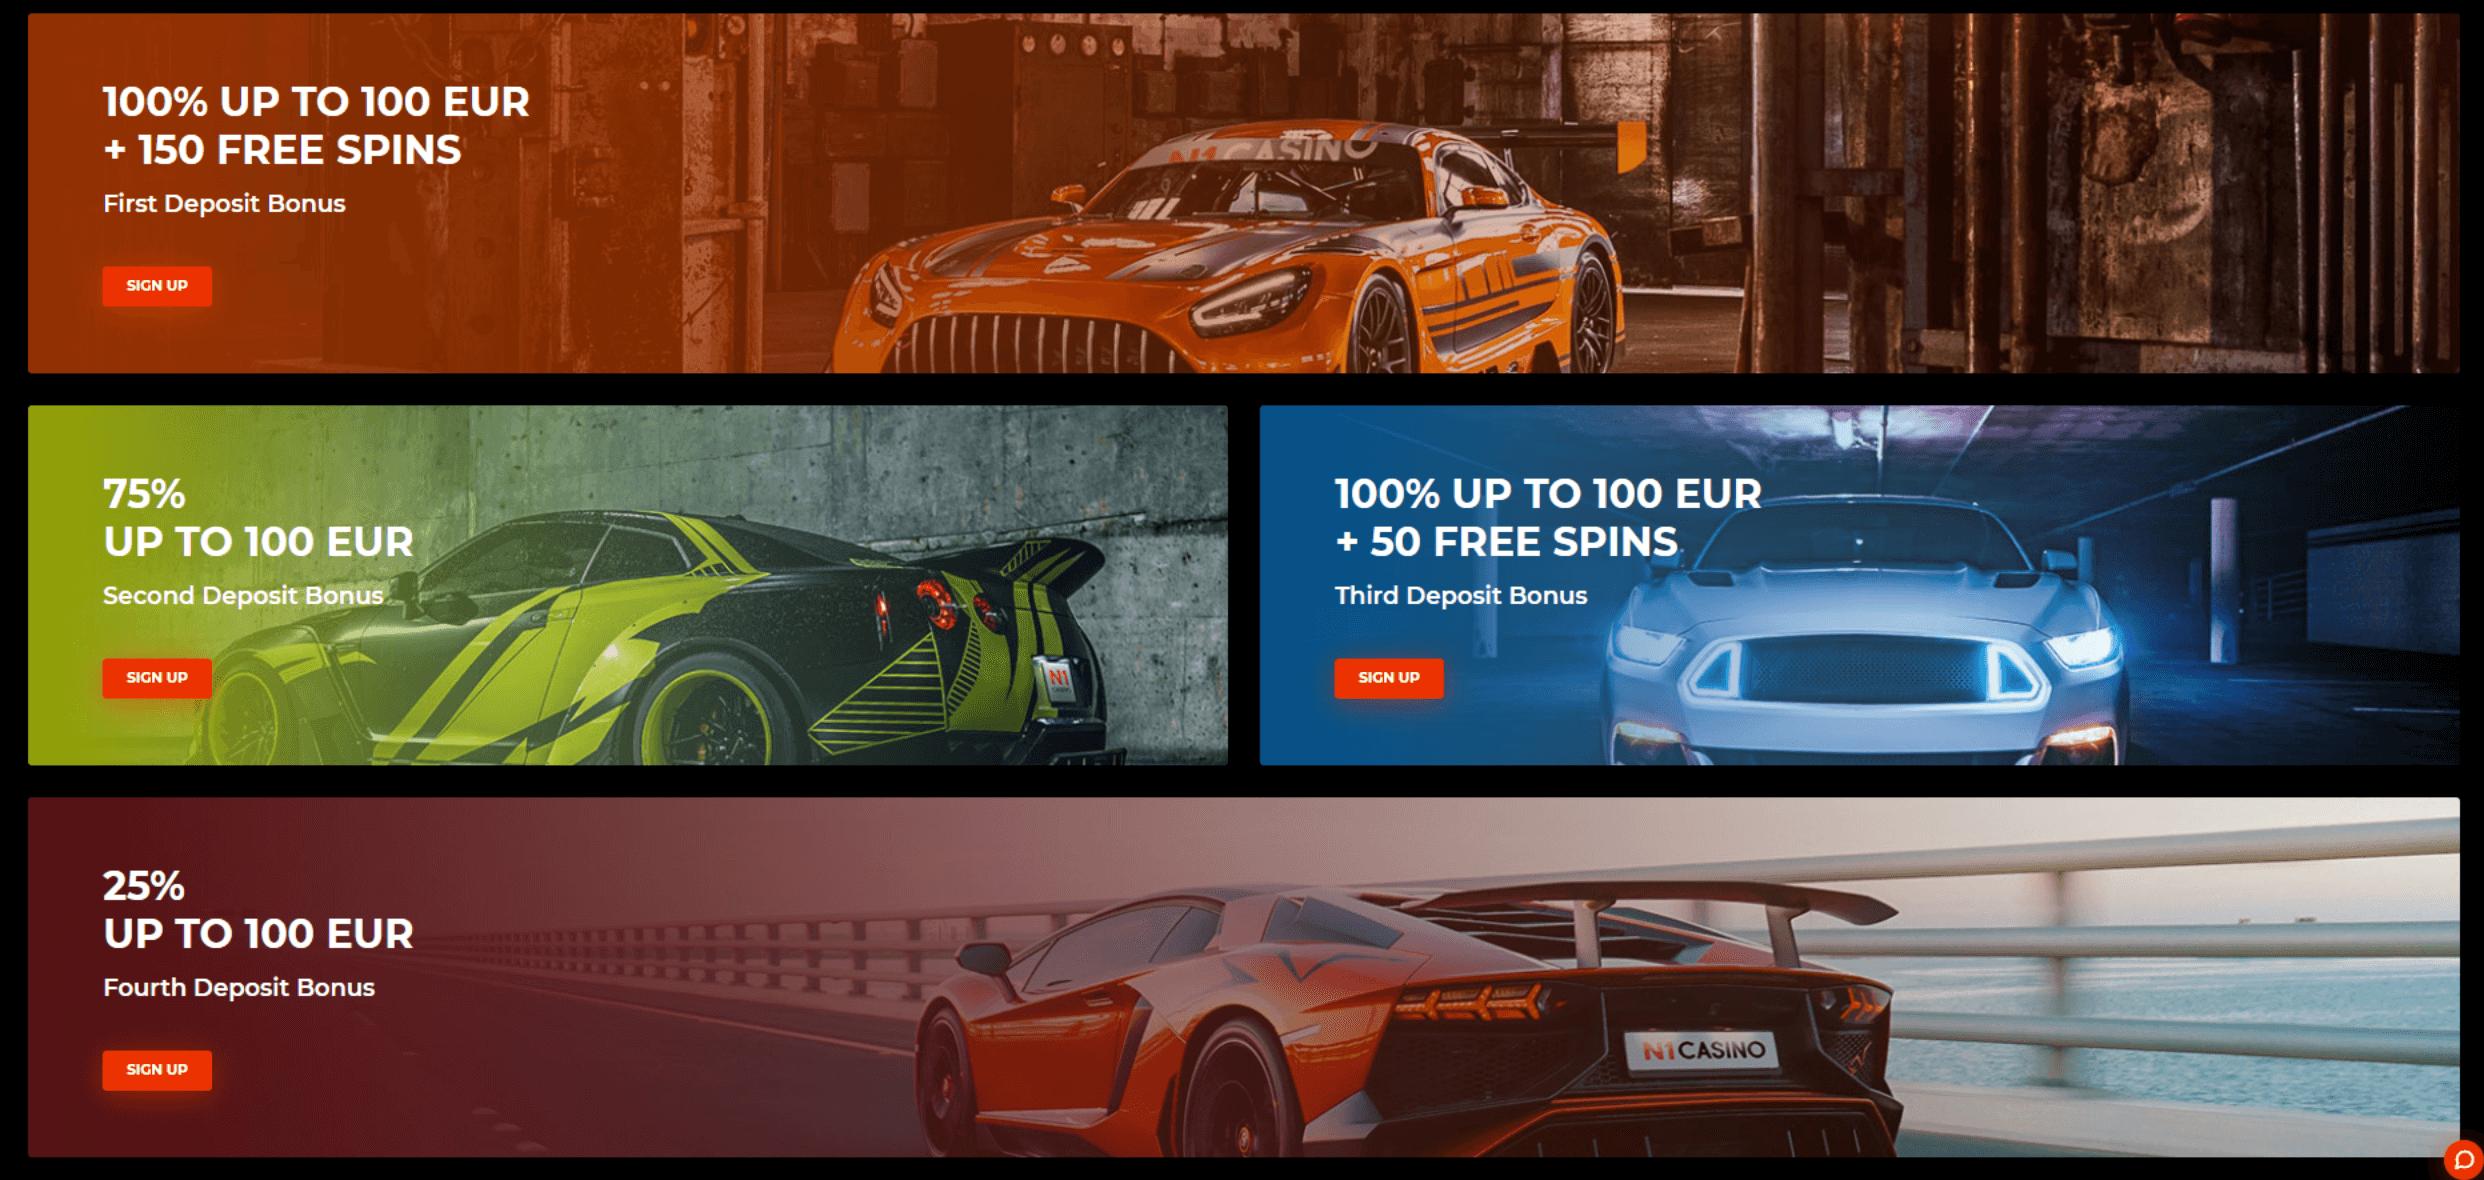 n1 casino welcome bonuses